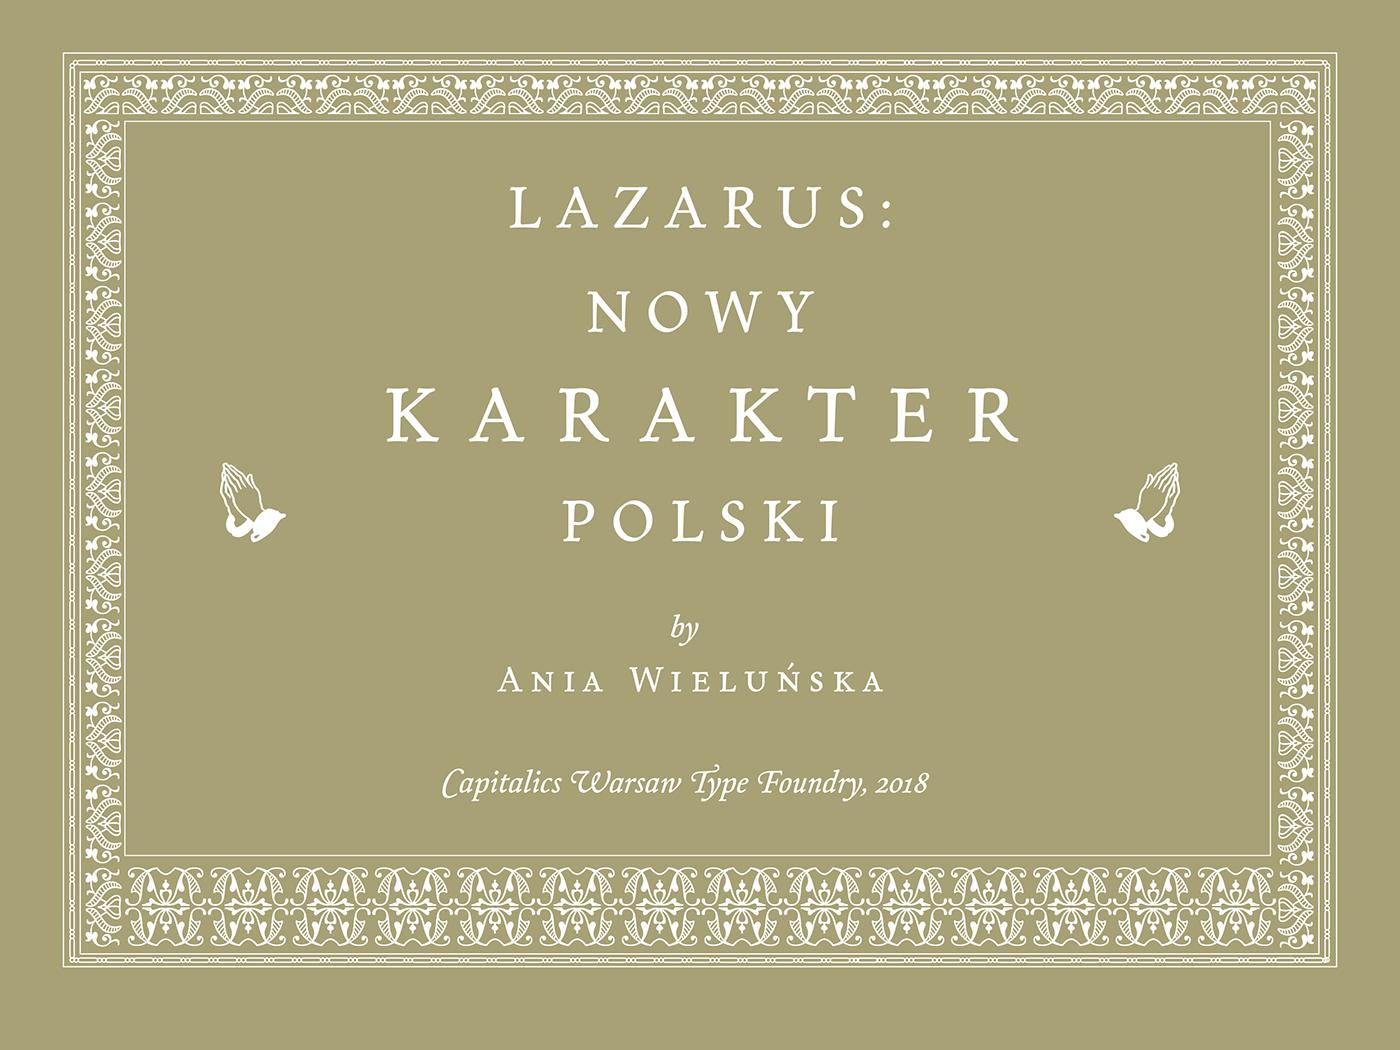 Lazarus (free) font on Behance